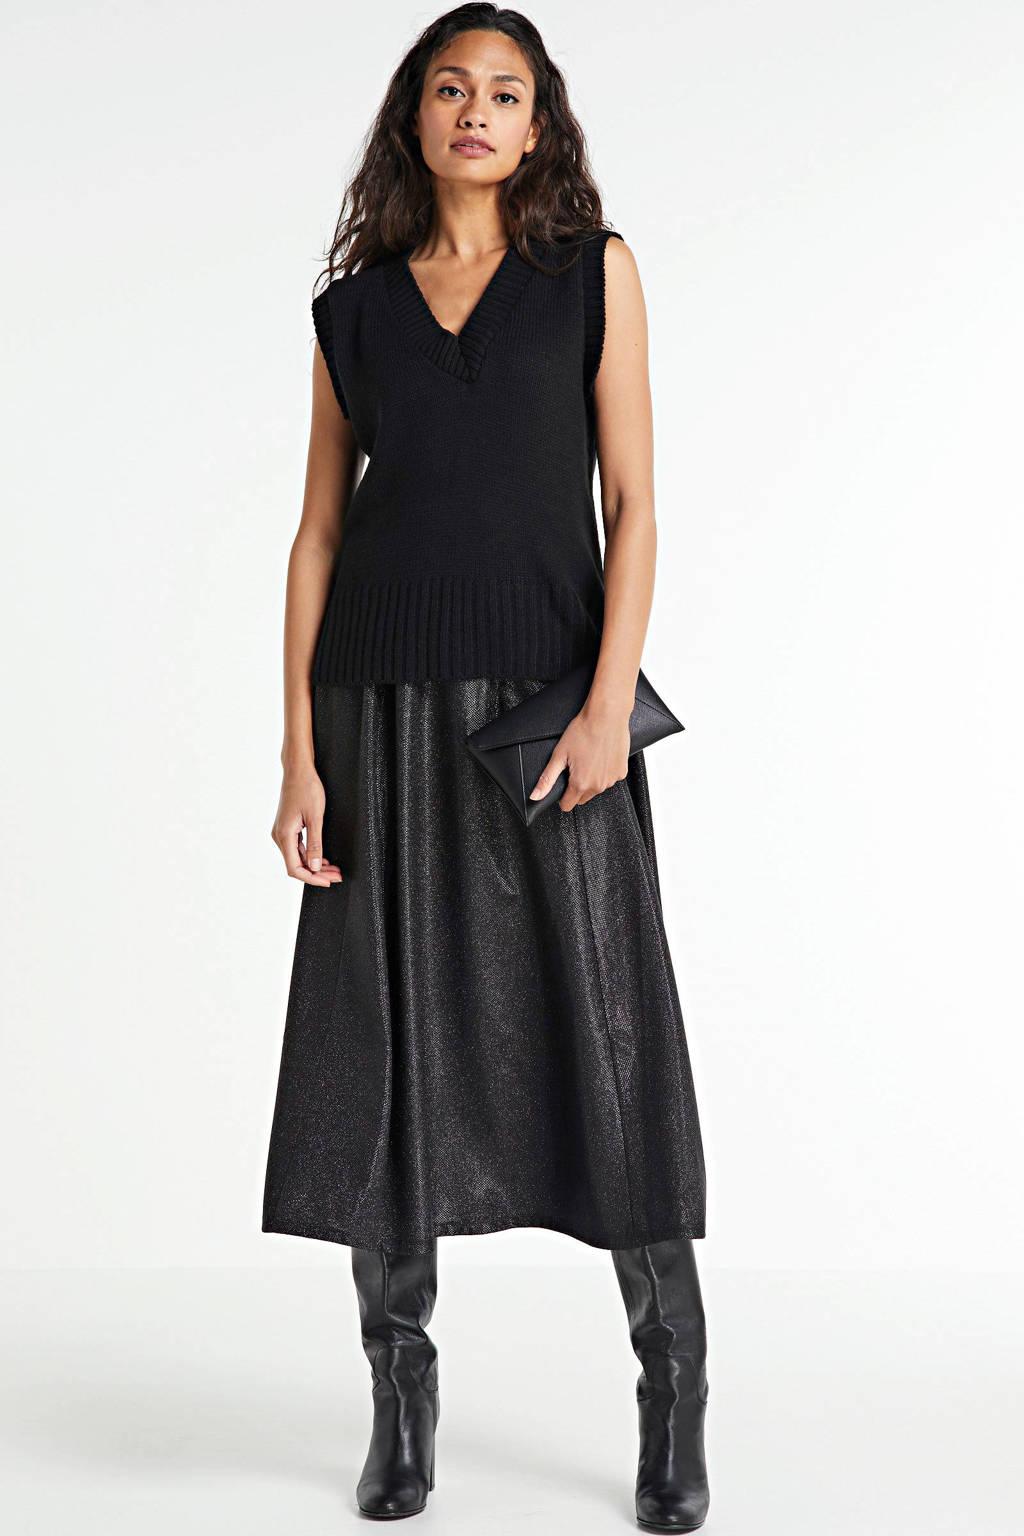 ONLY rok zwart met glitters, Zwart